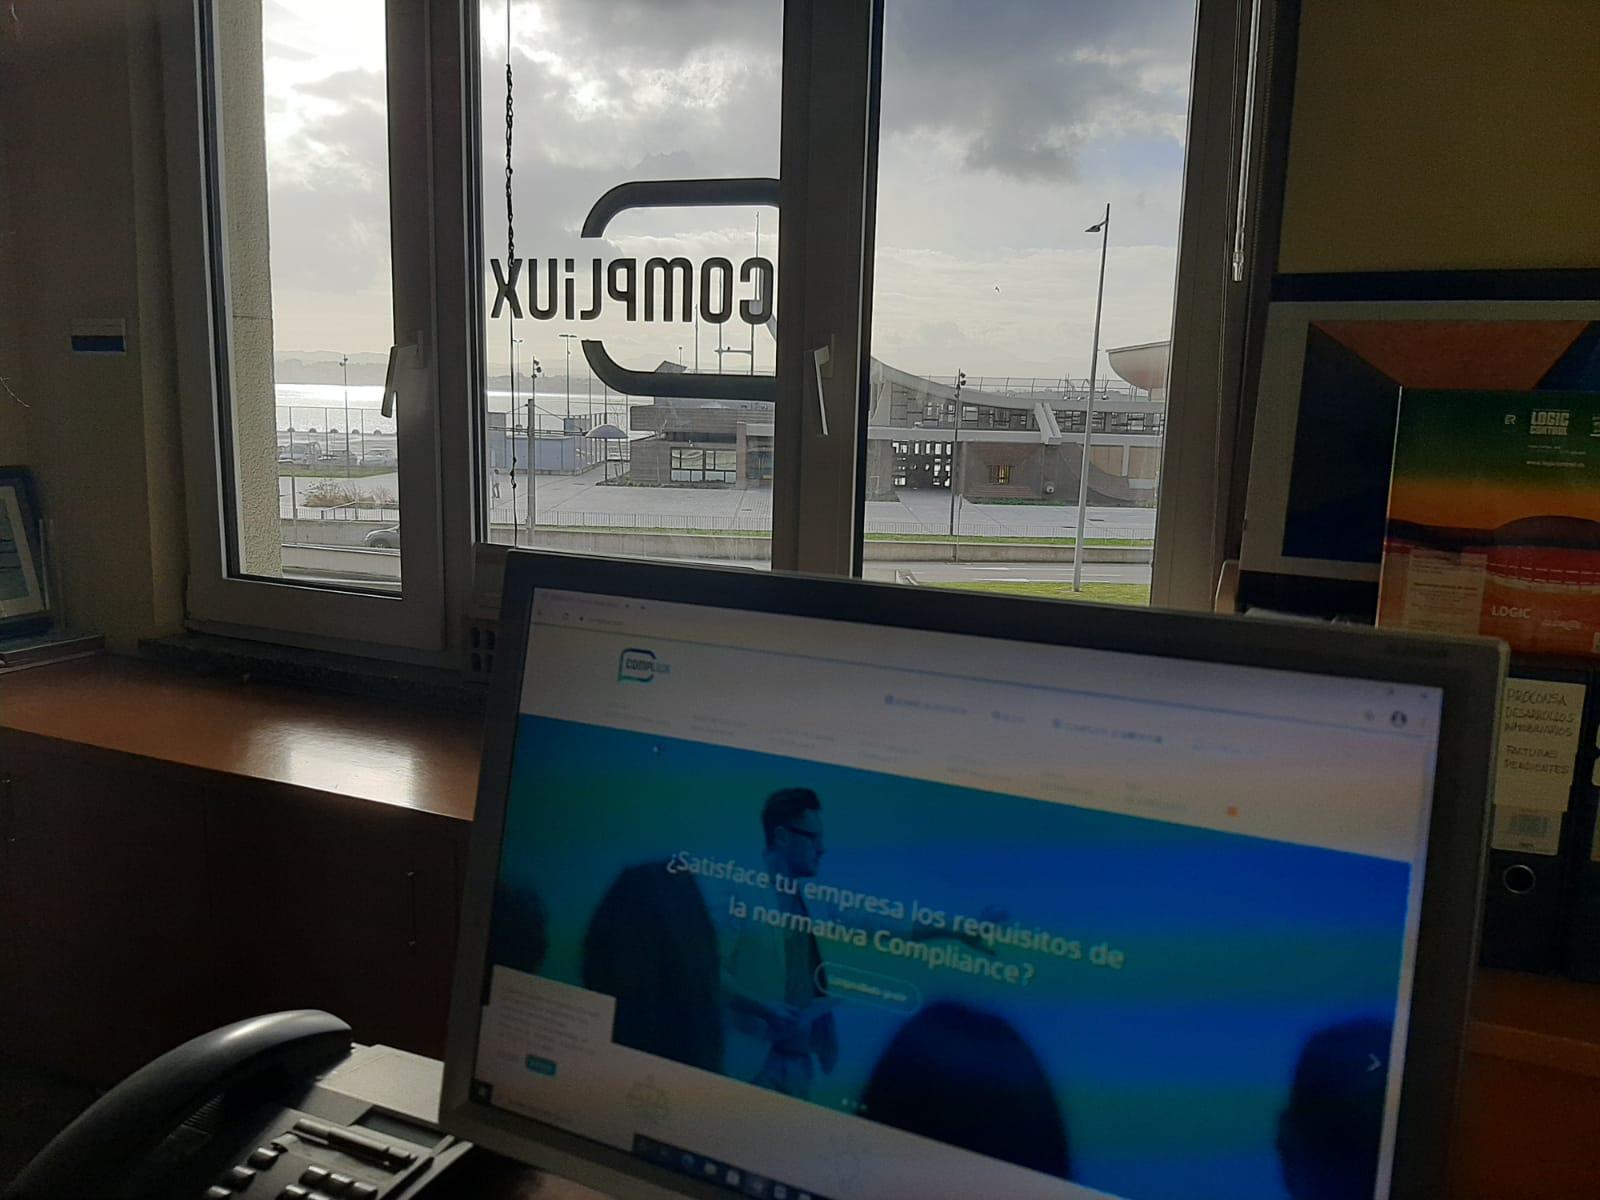 Oficina compliux-Santander